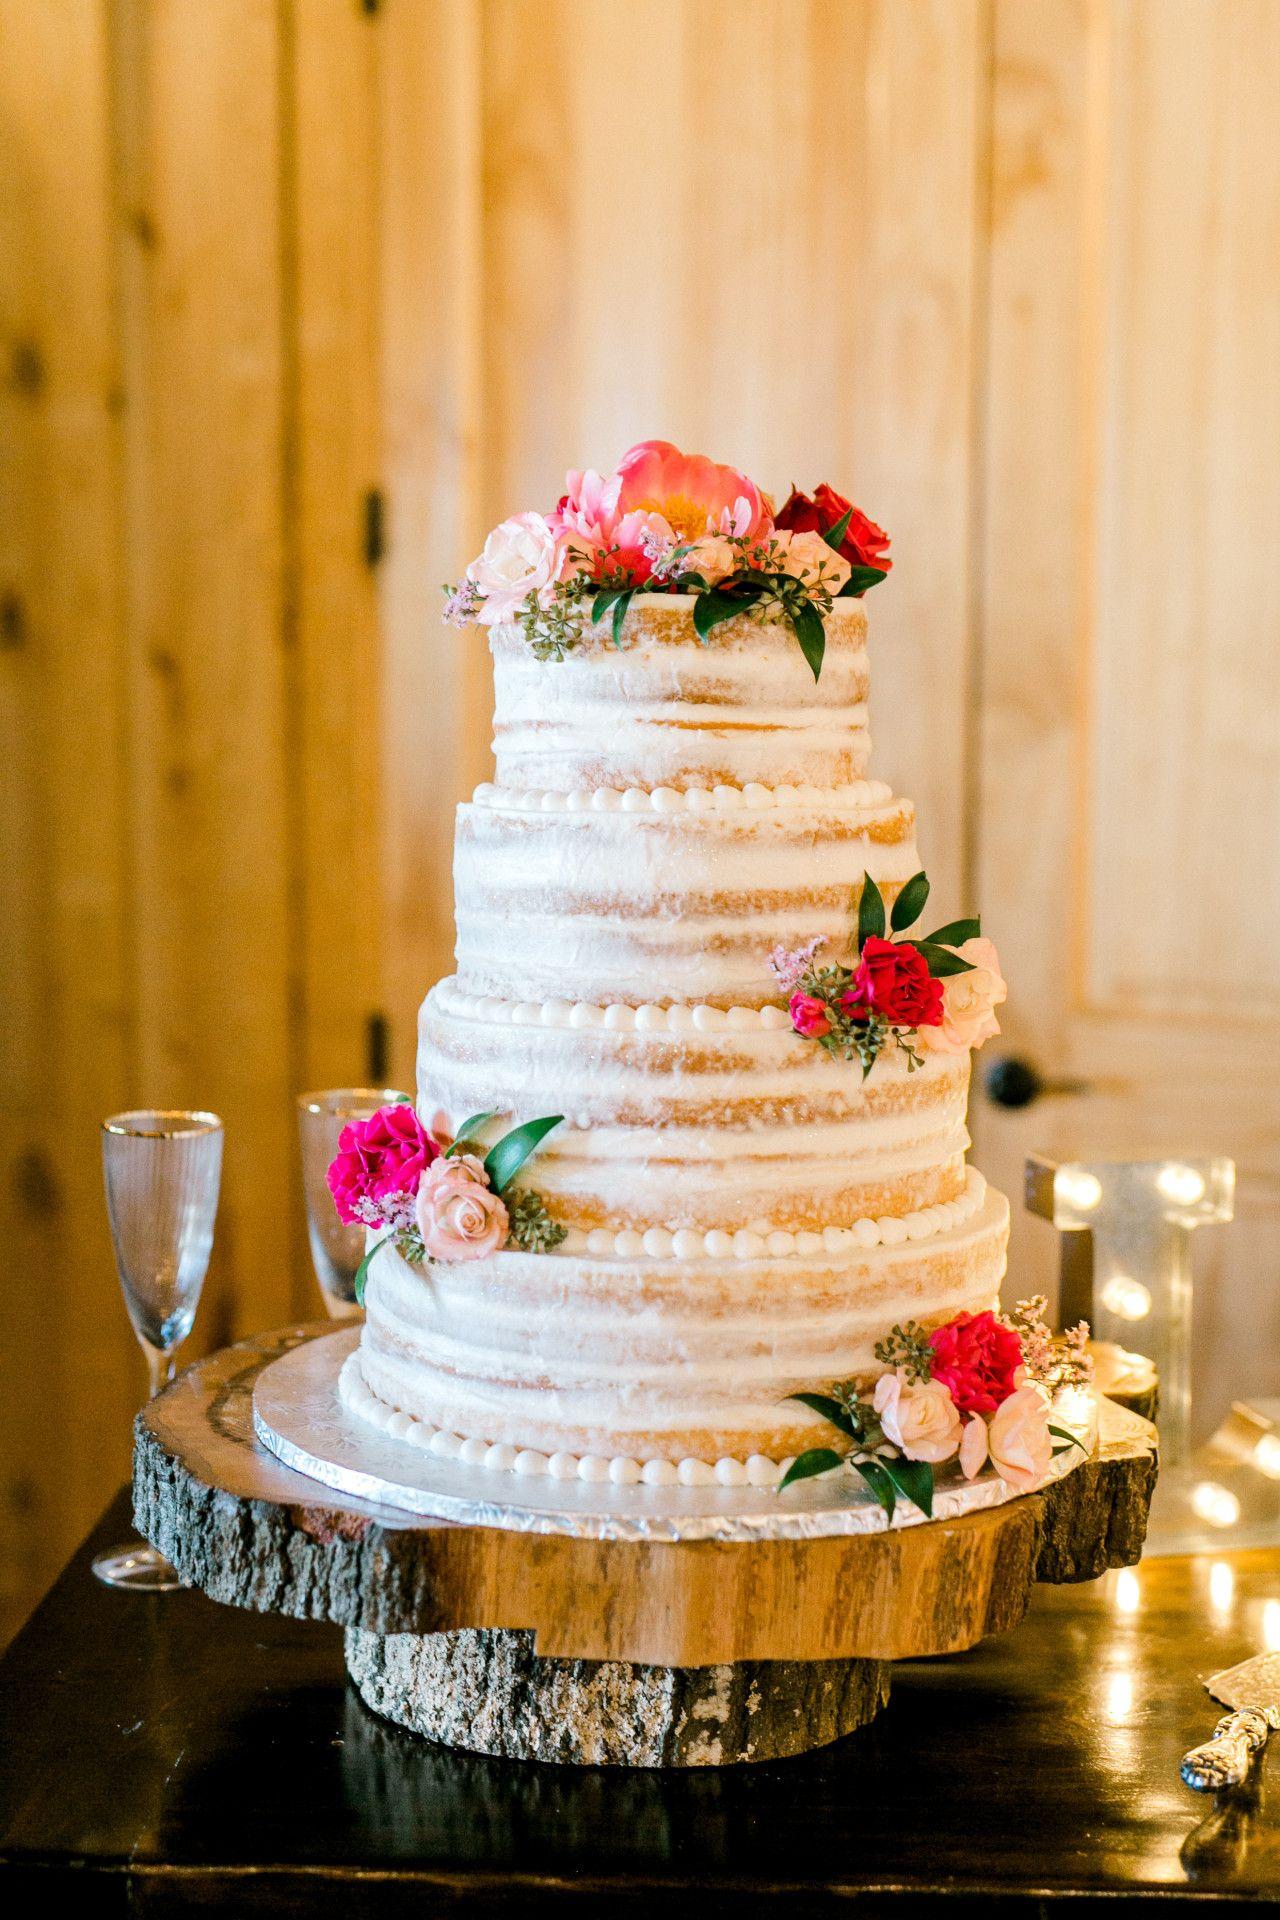 Naked Wedding Cake Summer Wedding Cake Hot Pink Wedding Cake